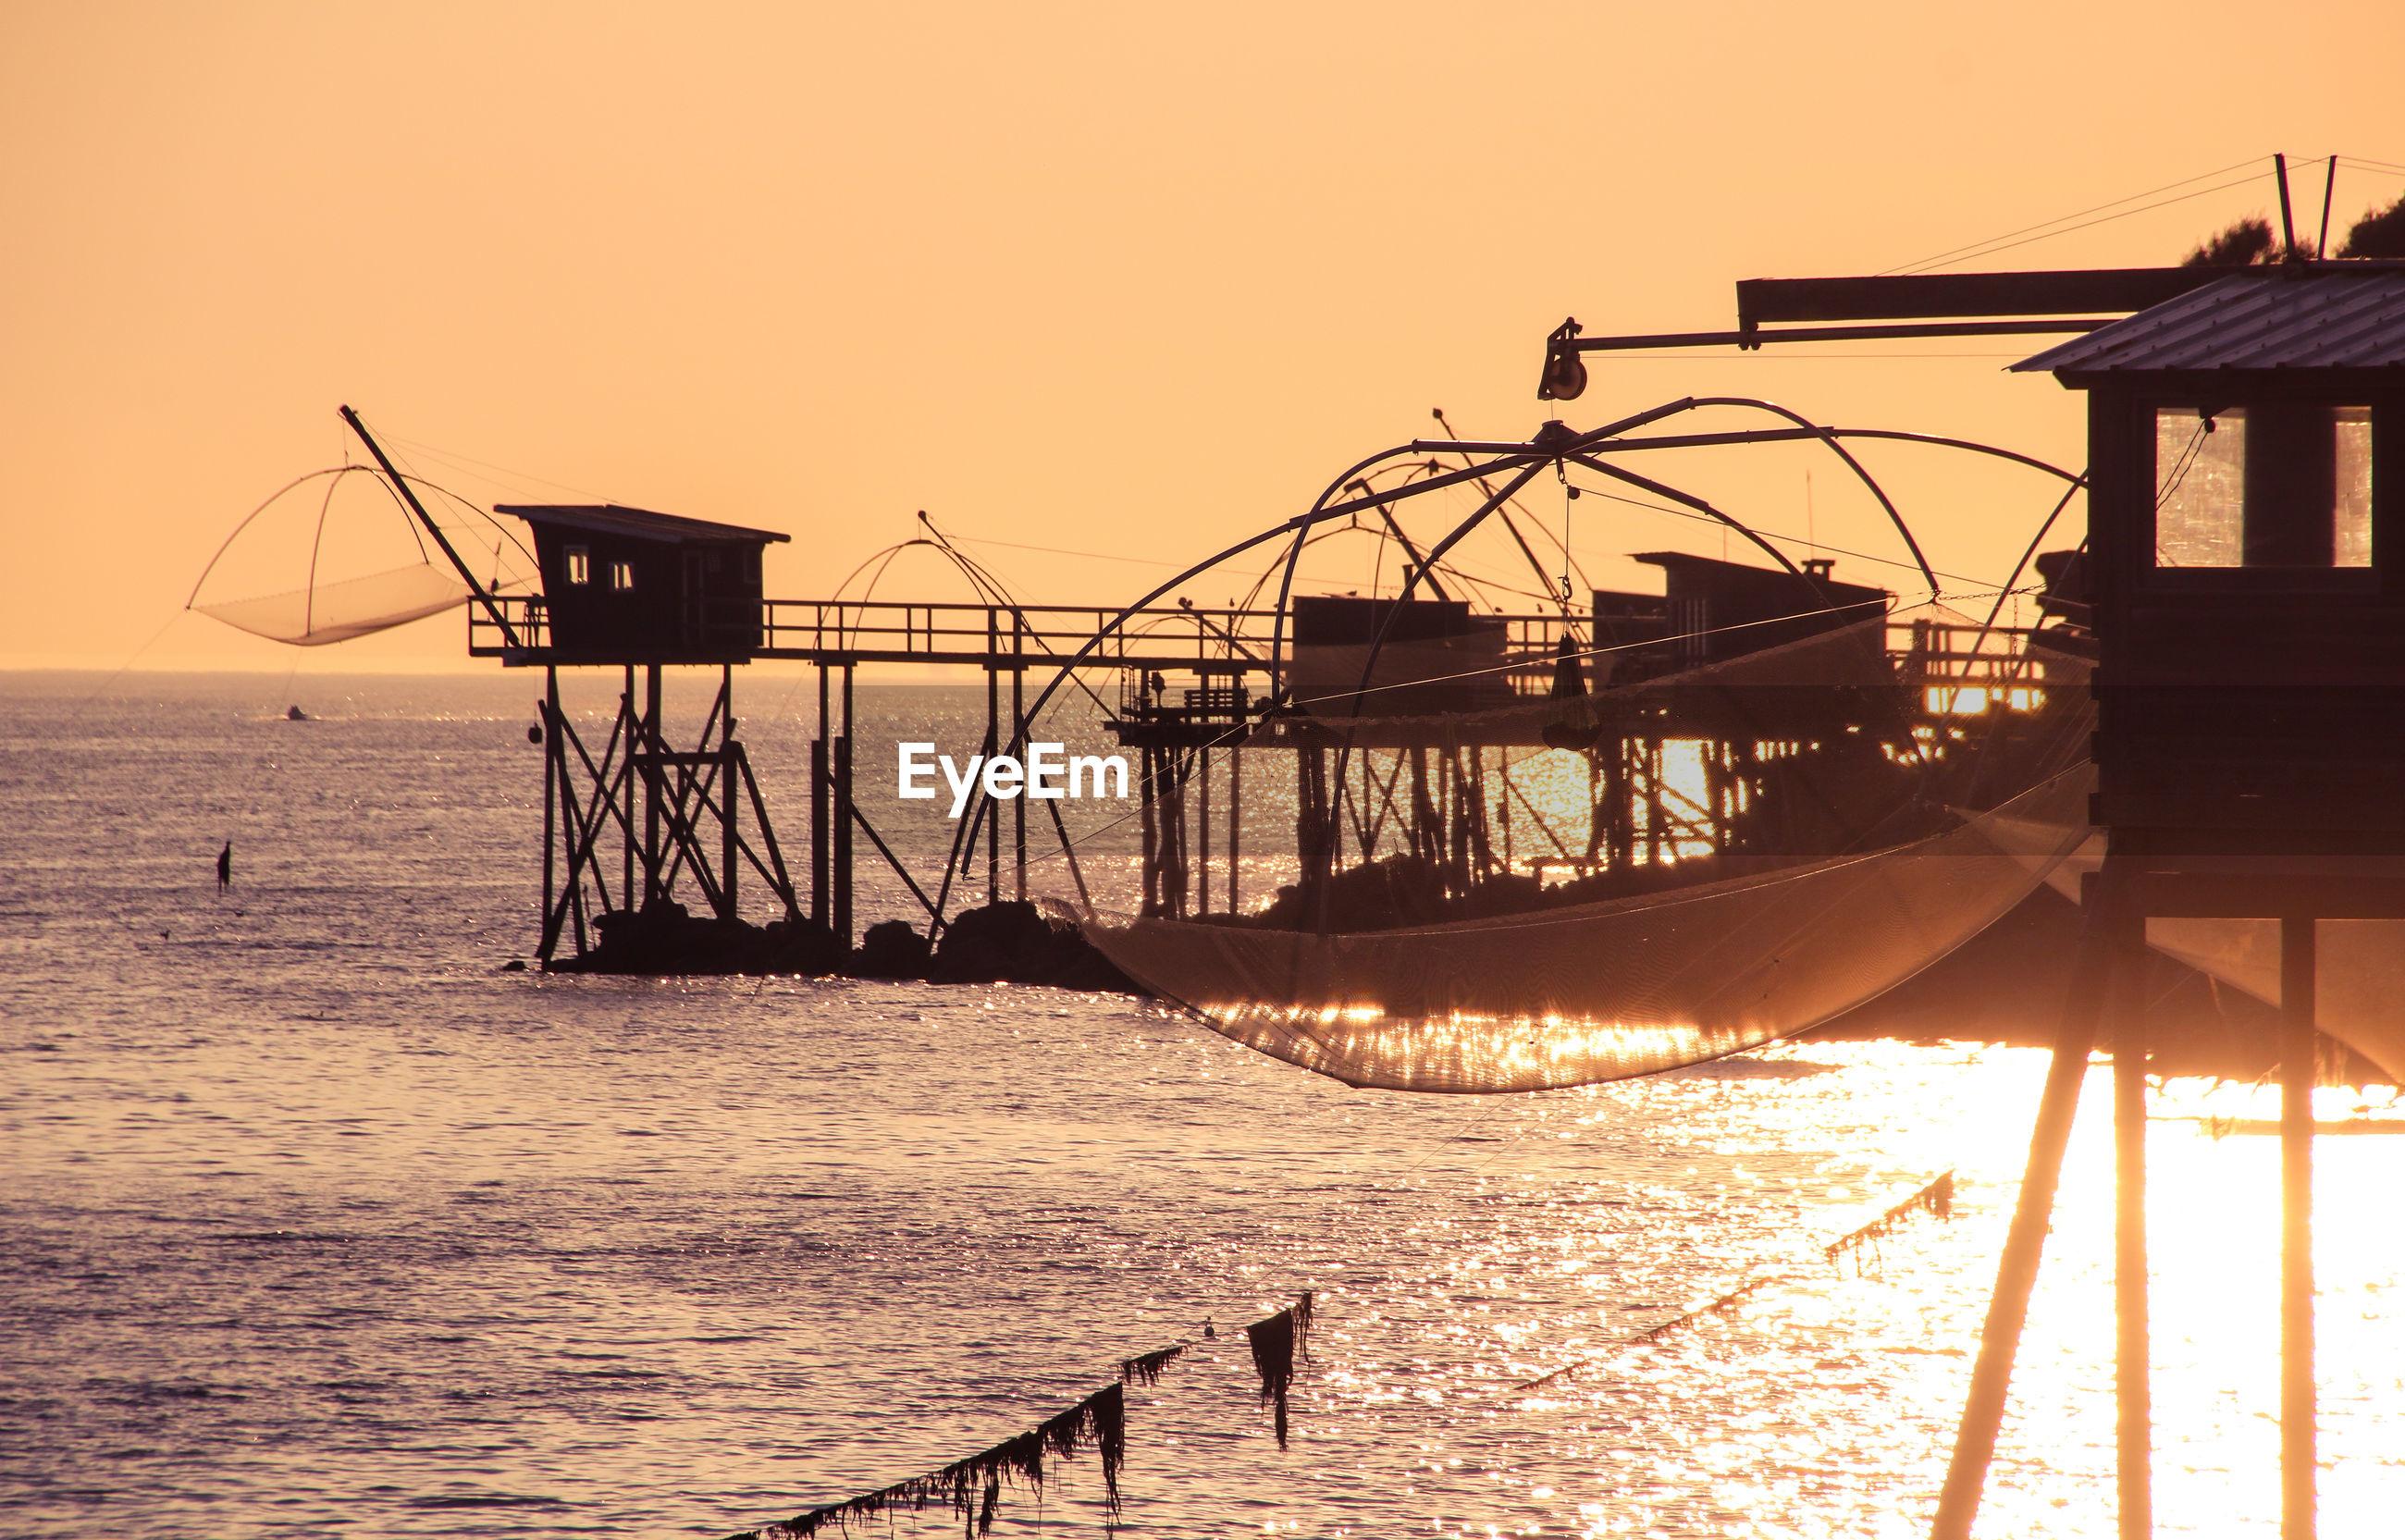 SILHOUETTE SAILBOATS ON SEA AGAINST CLEAR SKY